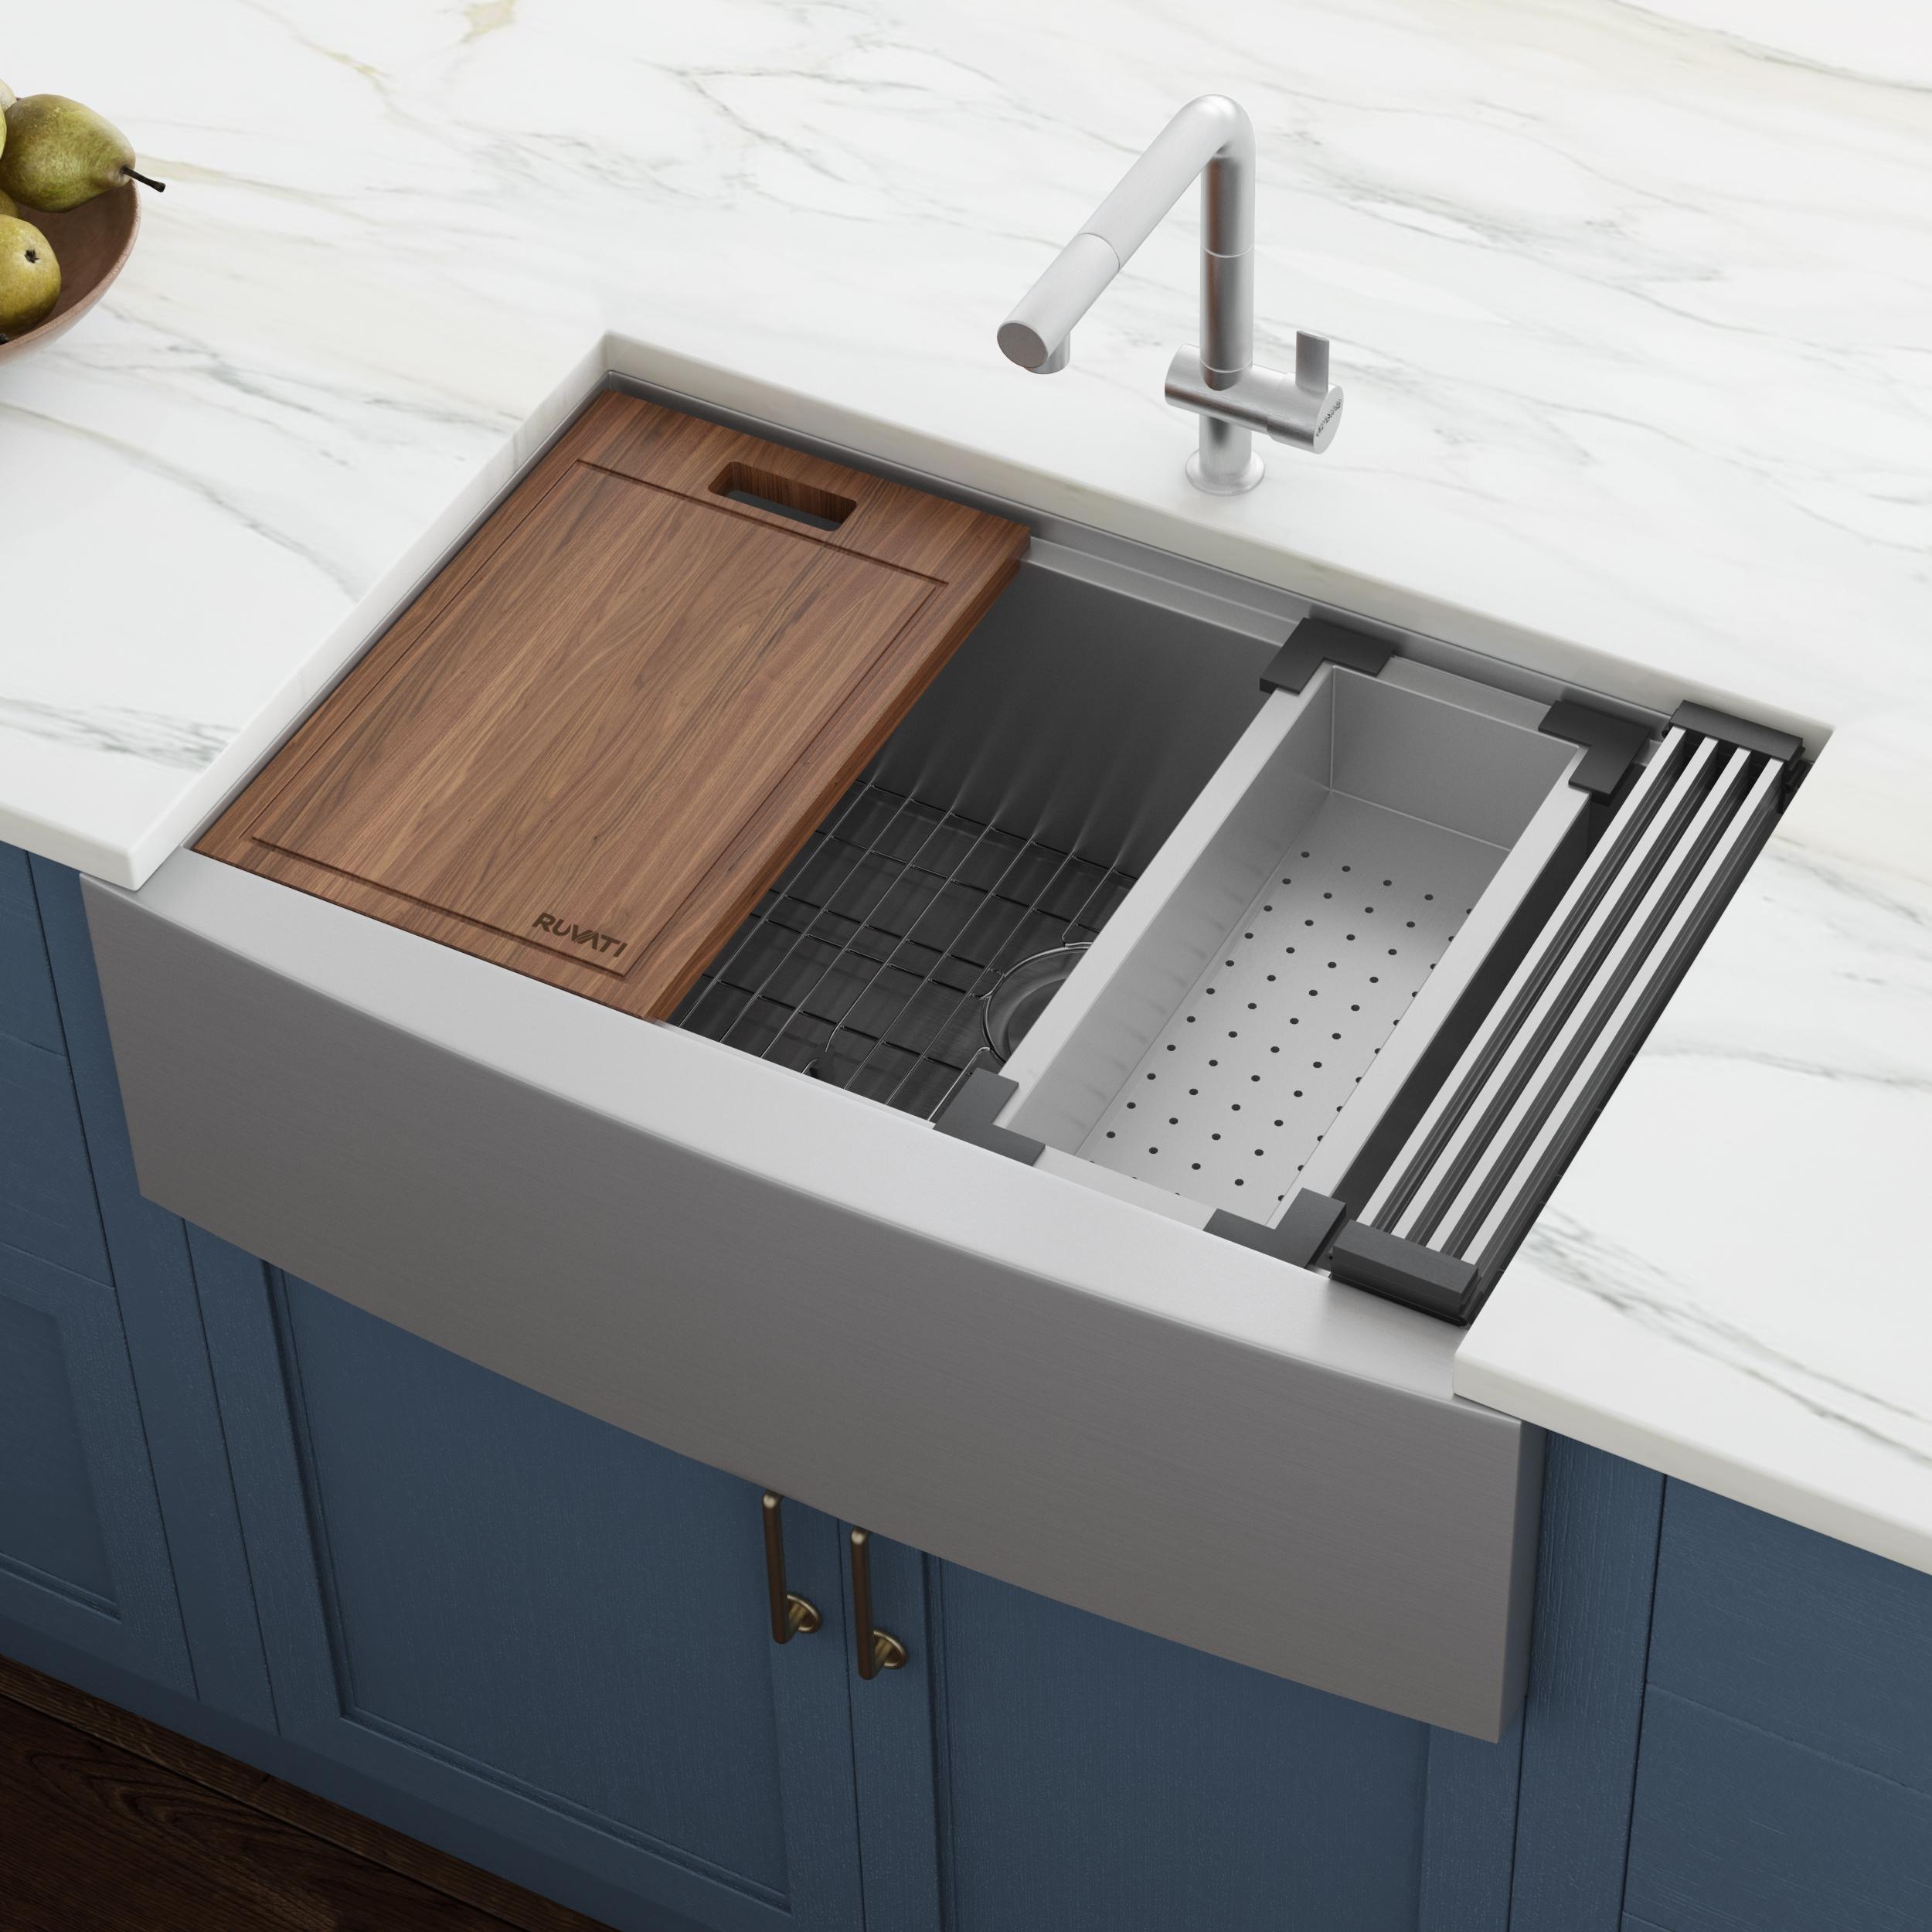 36 Inch Apron Front Workstation Farmhouse Kitchen Sink 16 Gauge Stainless Steel Single Bowl Ruvati Usa